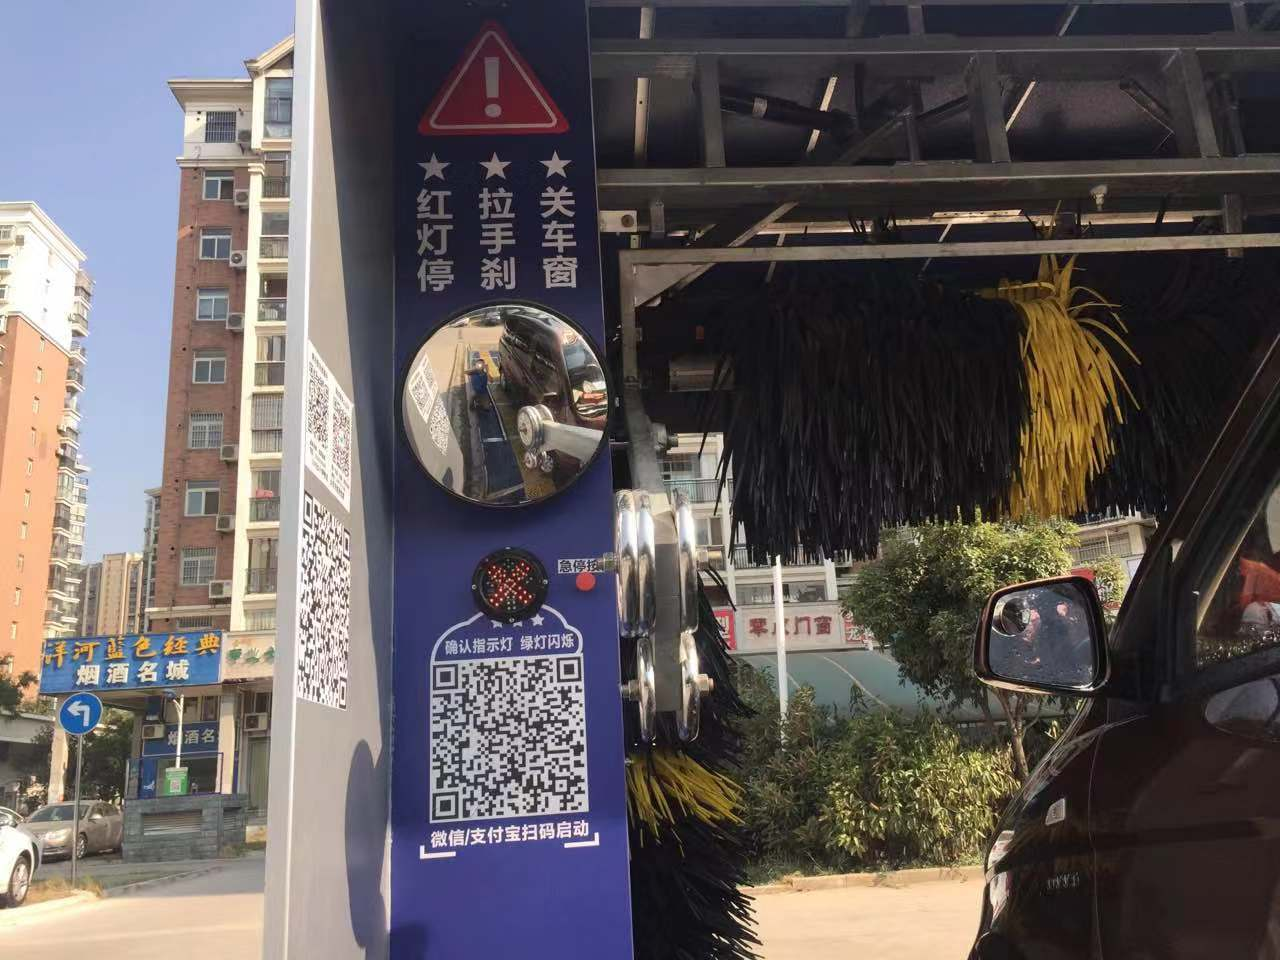 bao价合理的zhi能洗车ji|供应湖北实惠的捷洁zhi能无人值shouzhi能洗车设备